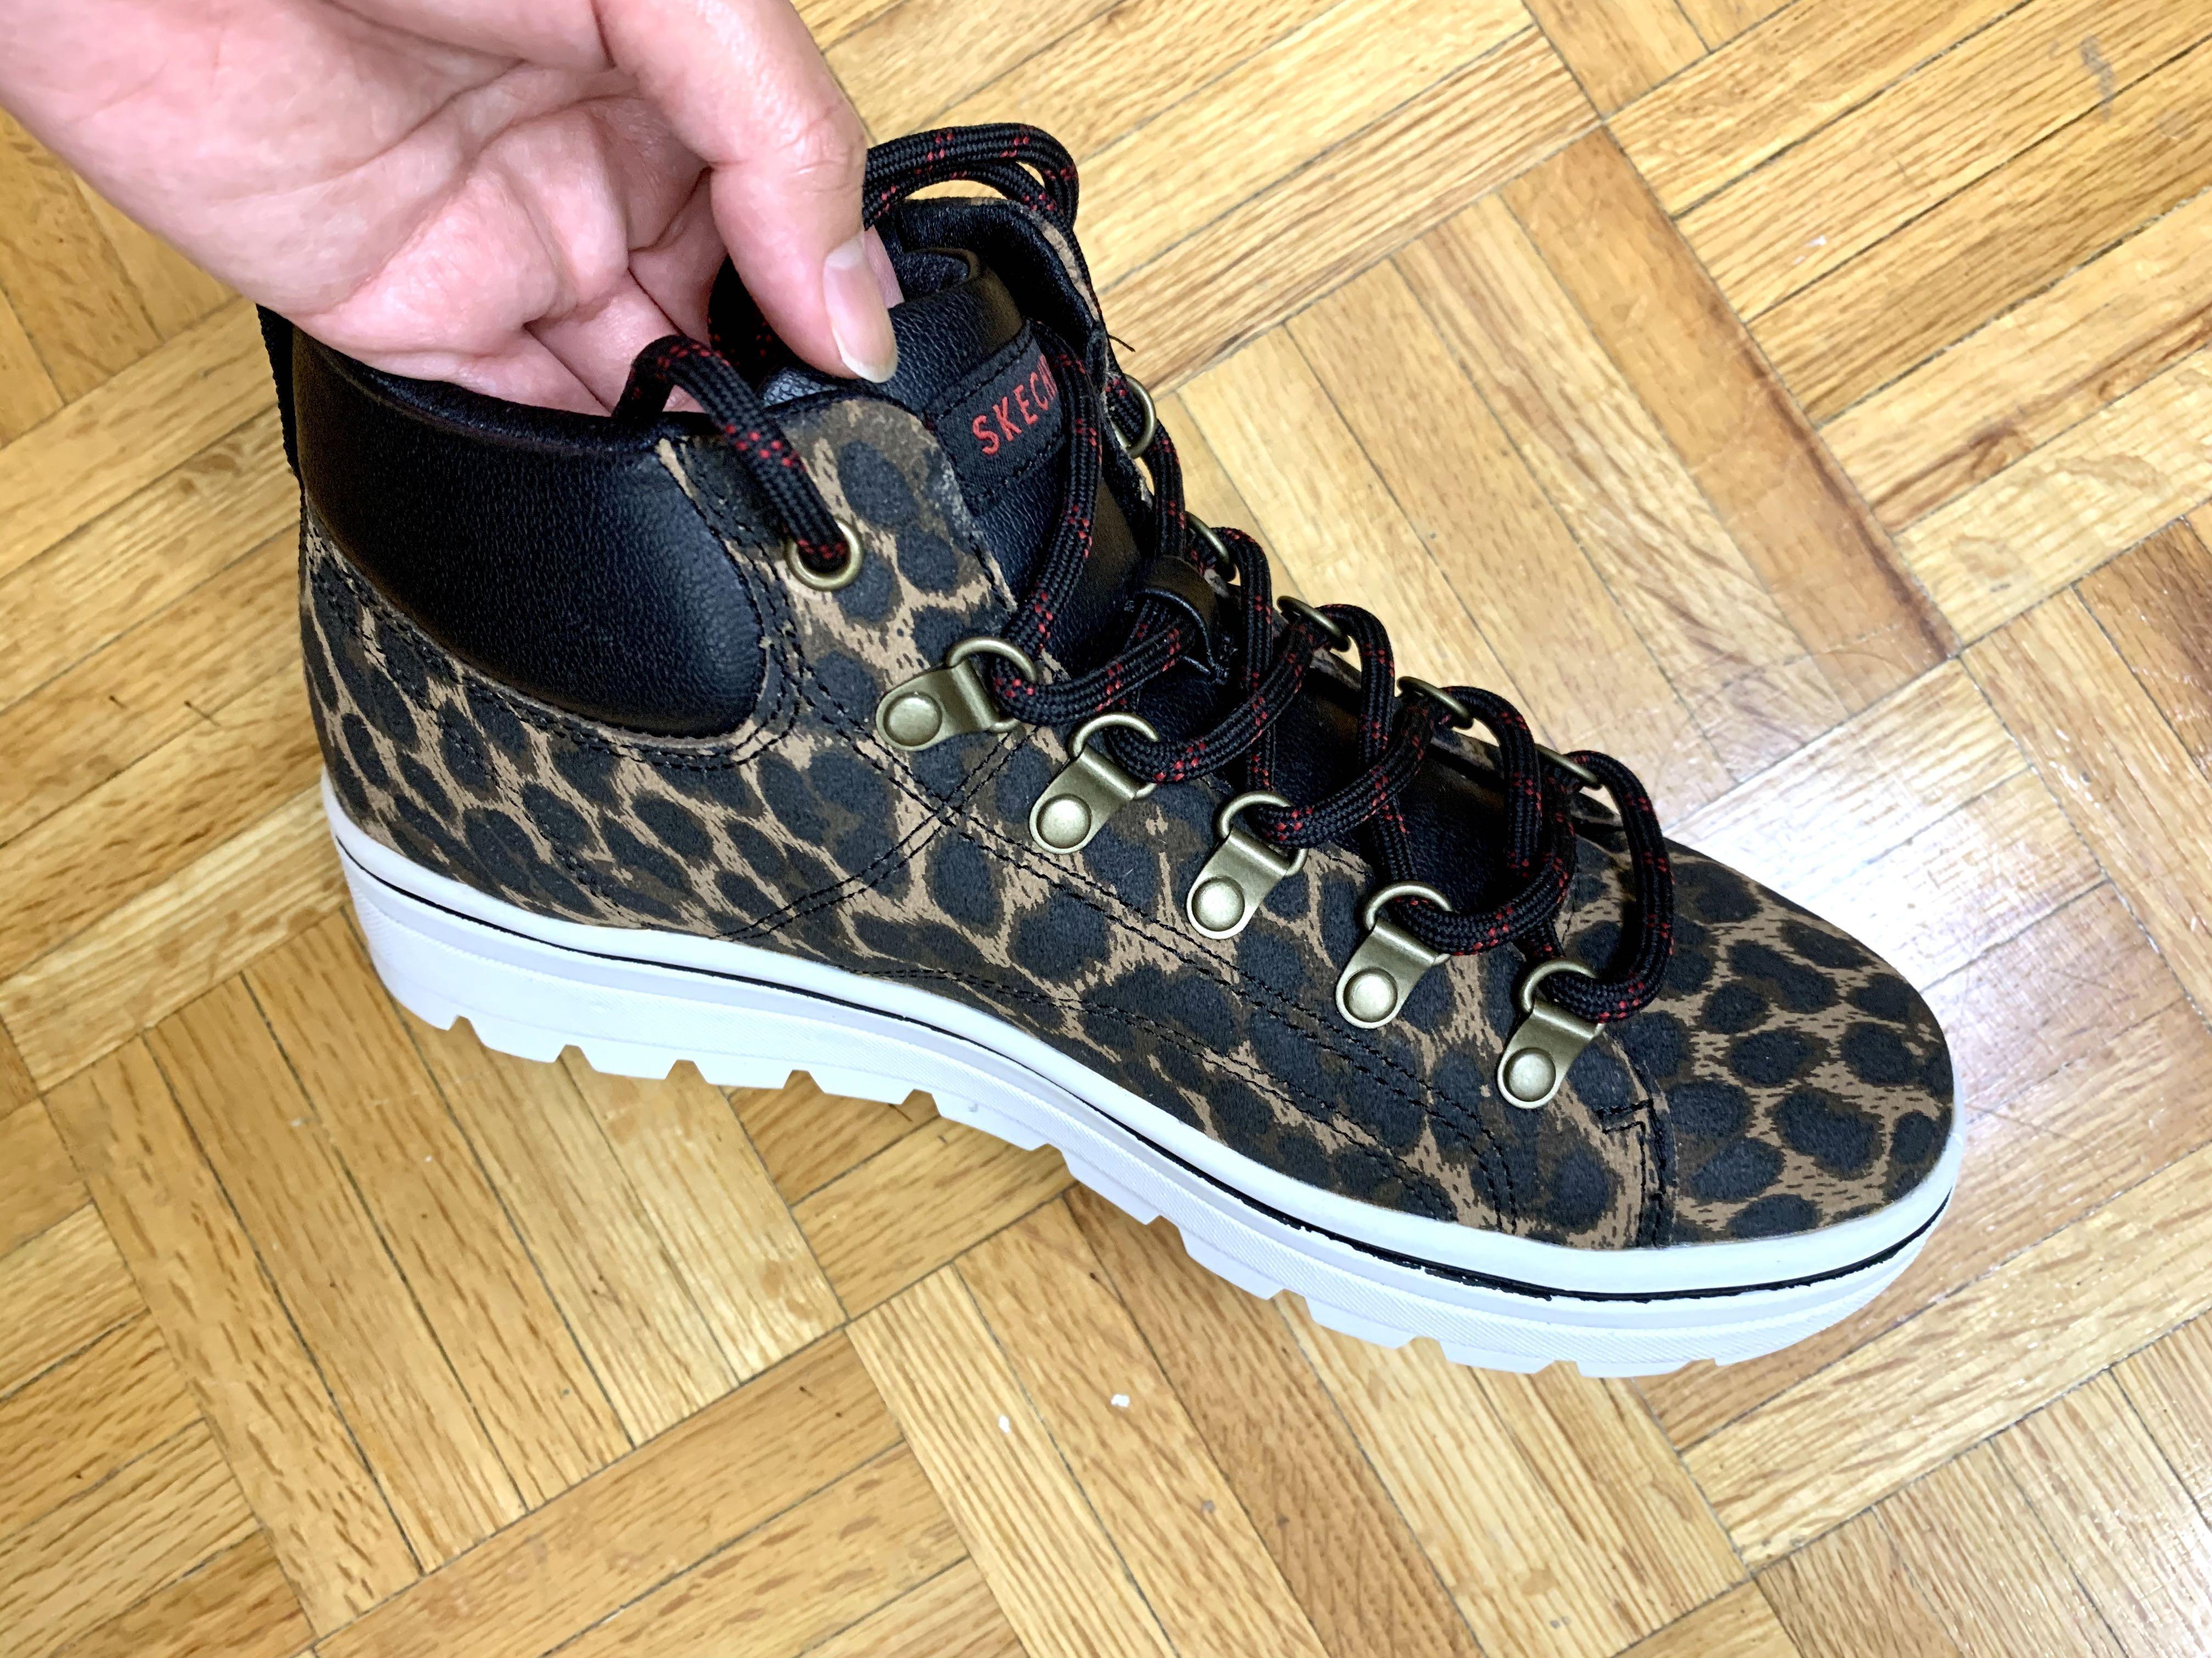 SKETCHERS mid top shoes(size 7)